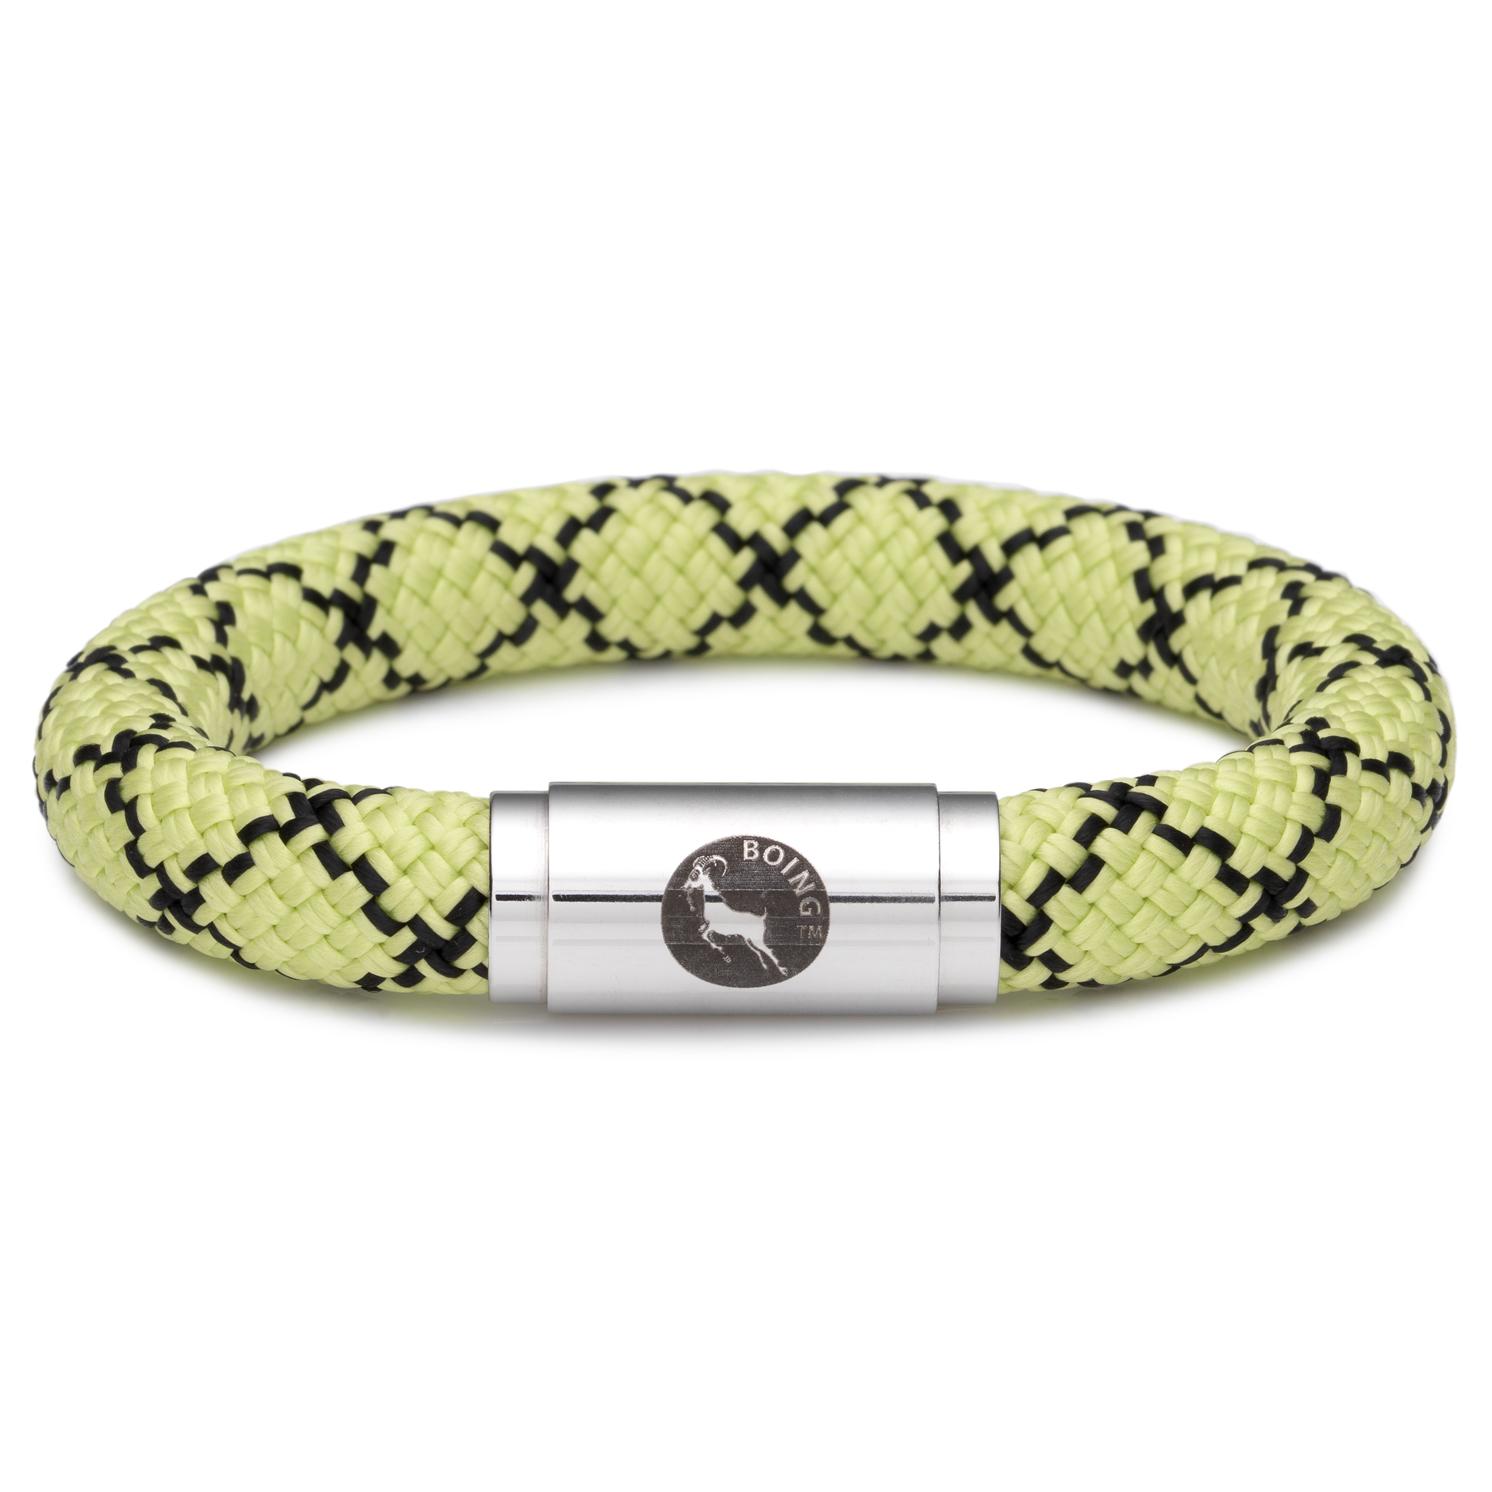 Boing – Chunky Large Wristband in Masai Green